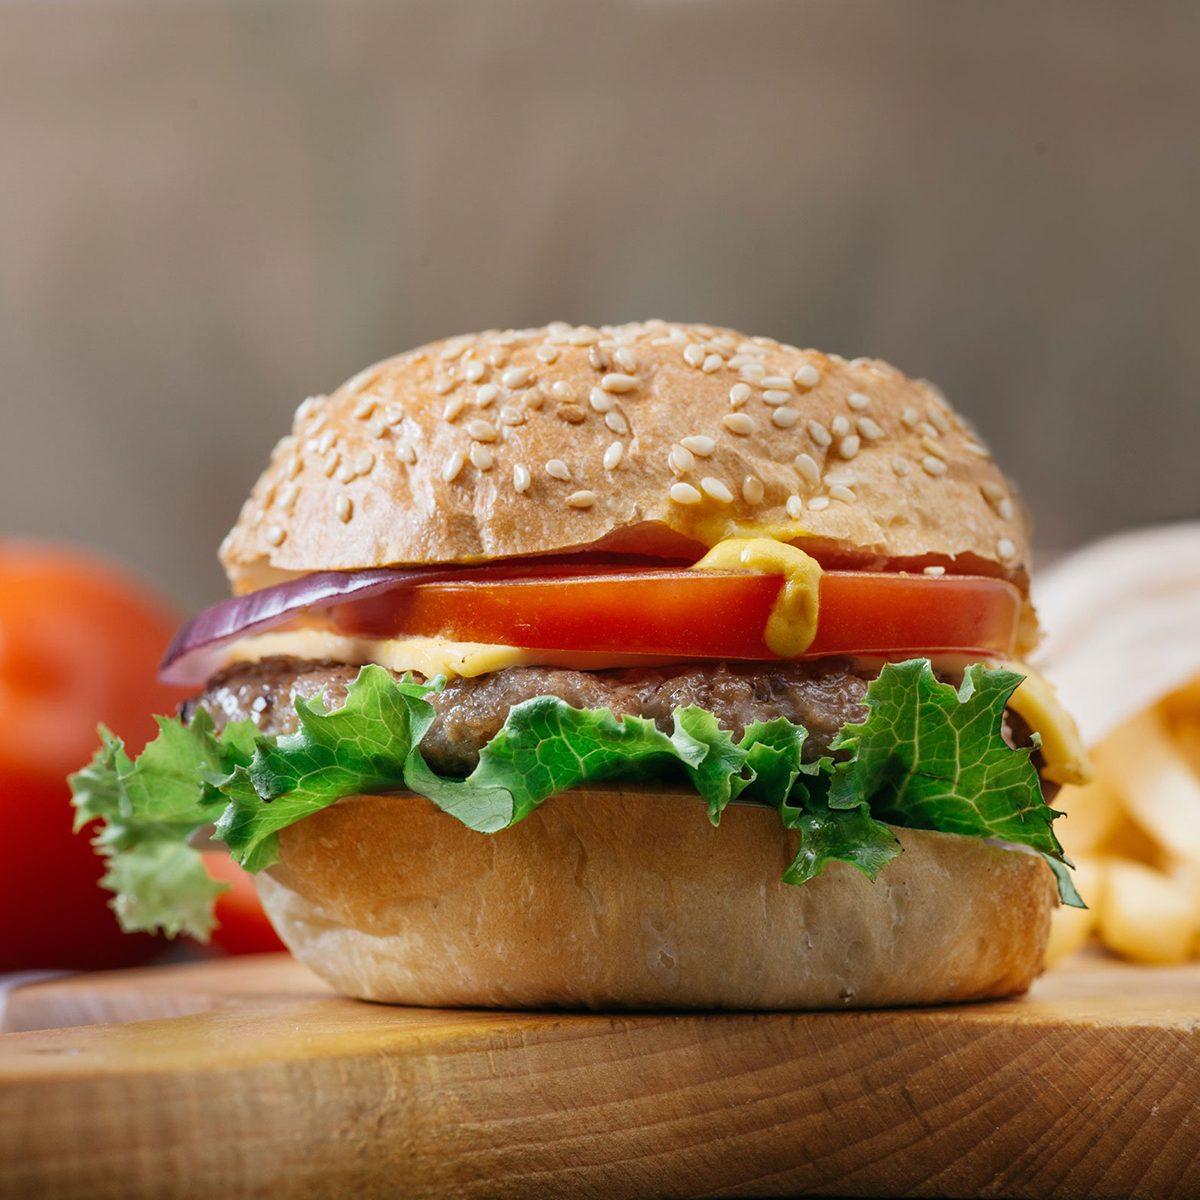 Best-seller burger